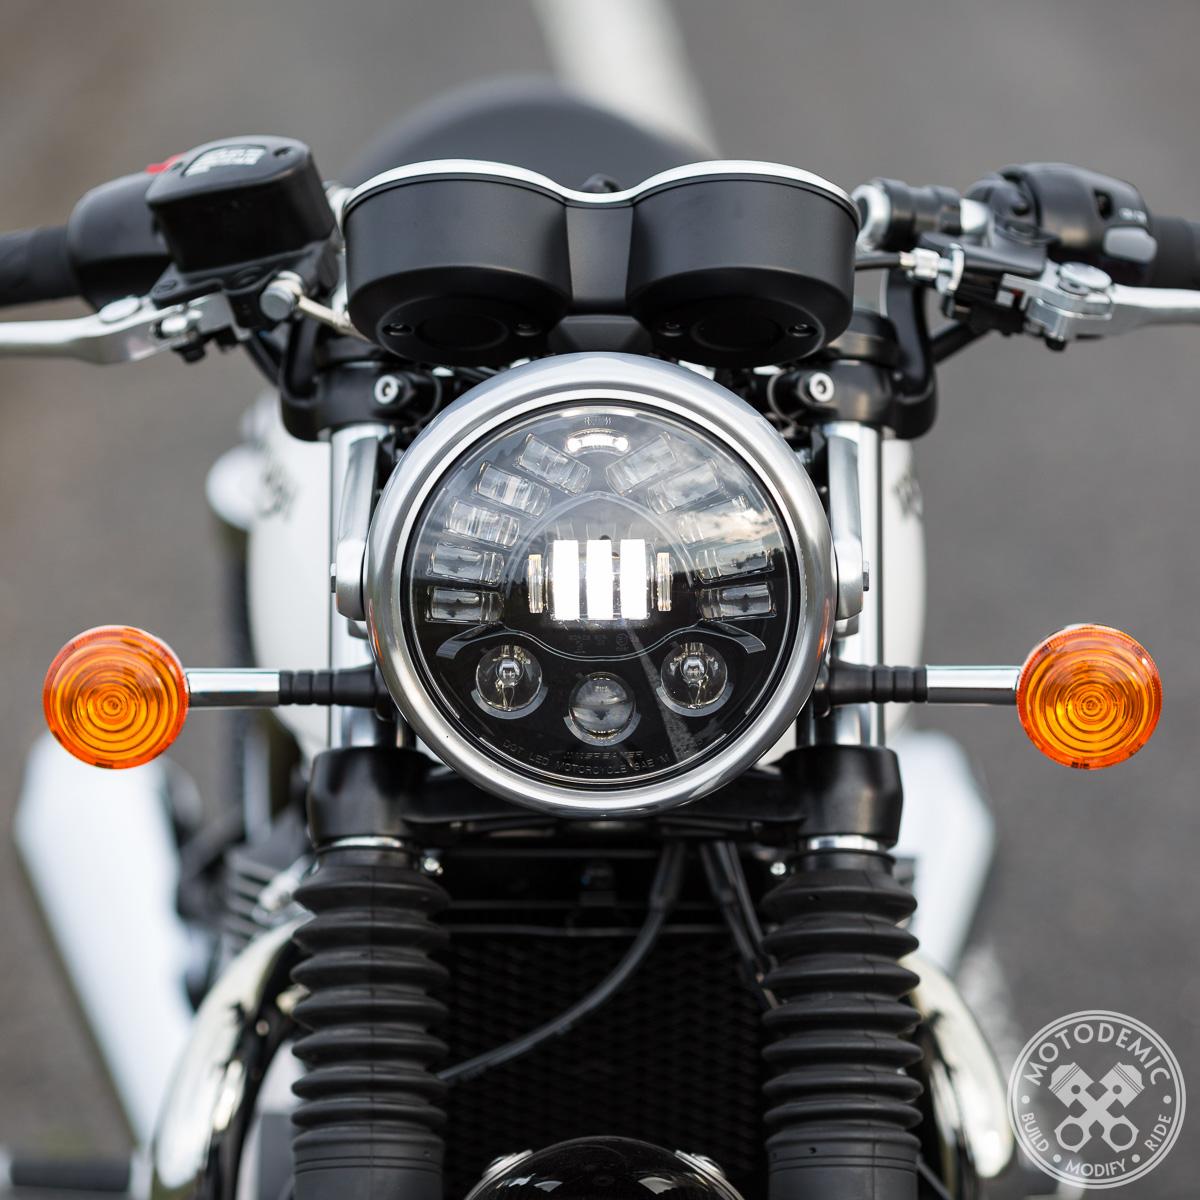 Single 7 Inch Adaptive LED Headlight Conversion Kit by Motodemic ... for Motorcycle Headlight Design  193tgx